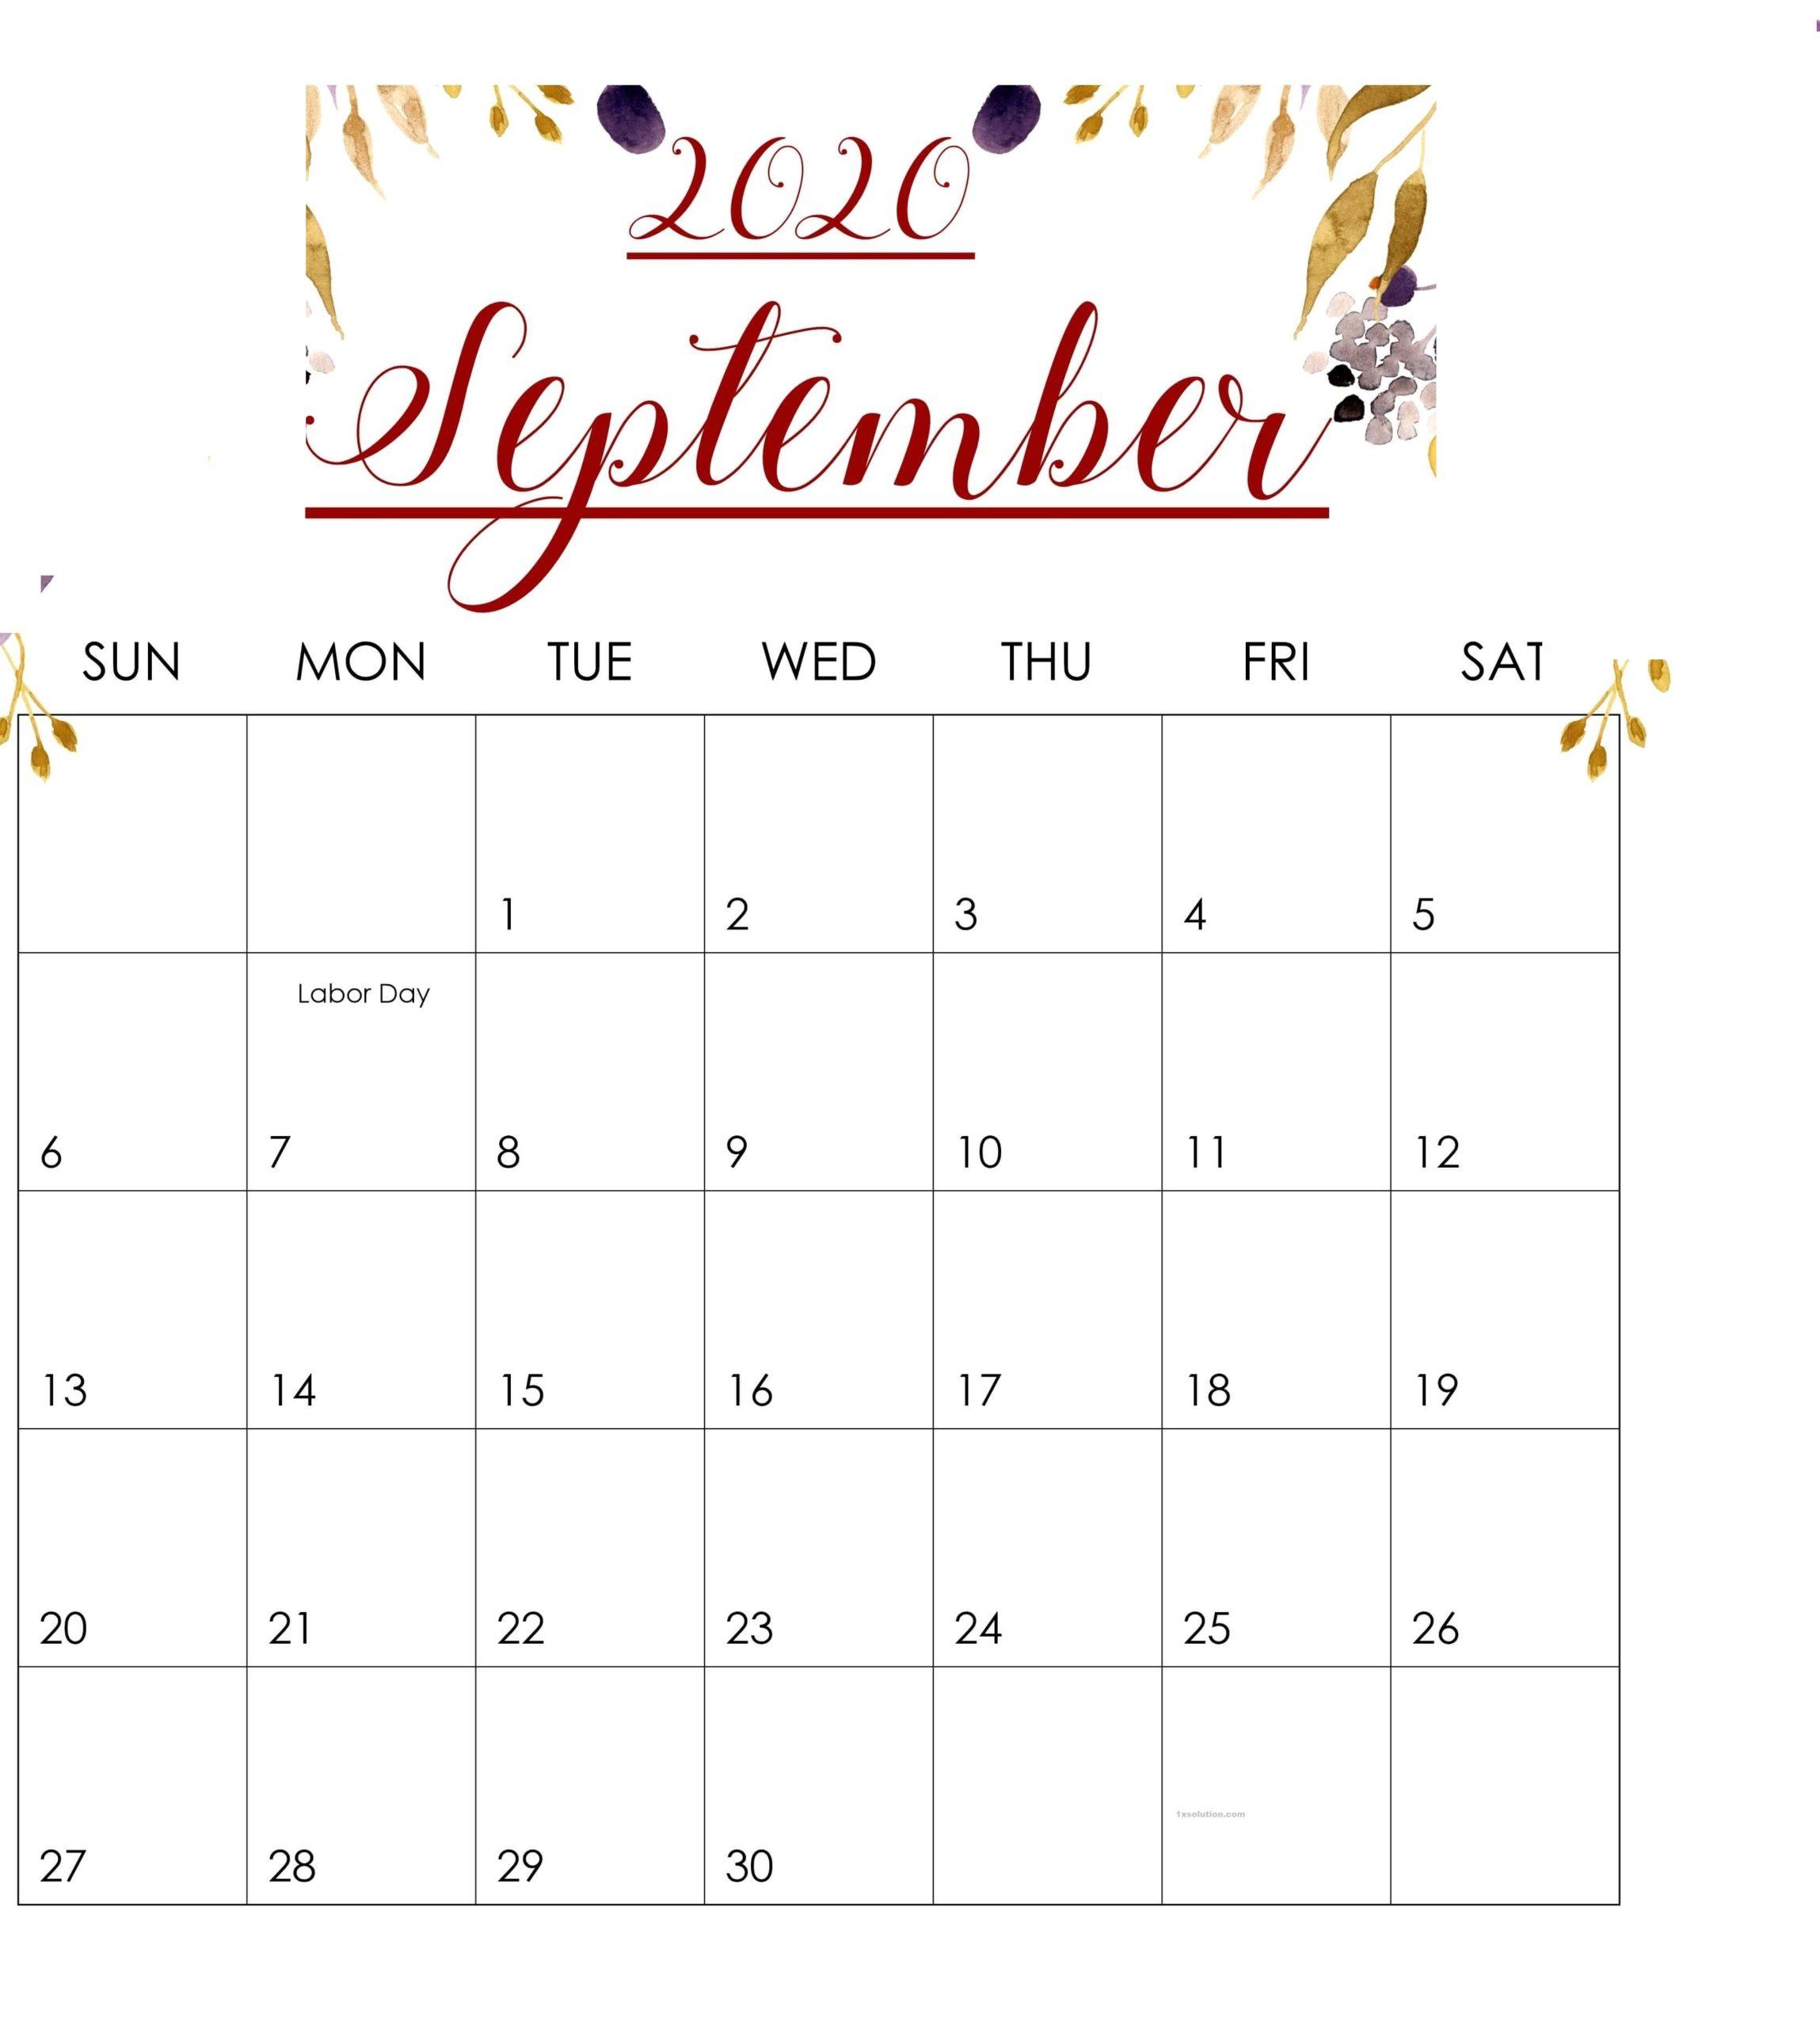 September 2020 Calendar Excel Sheet